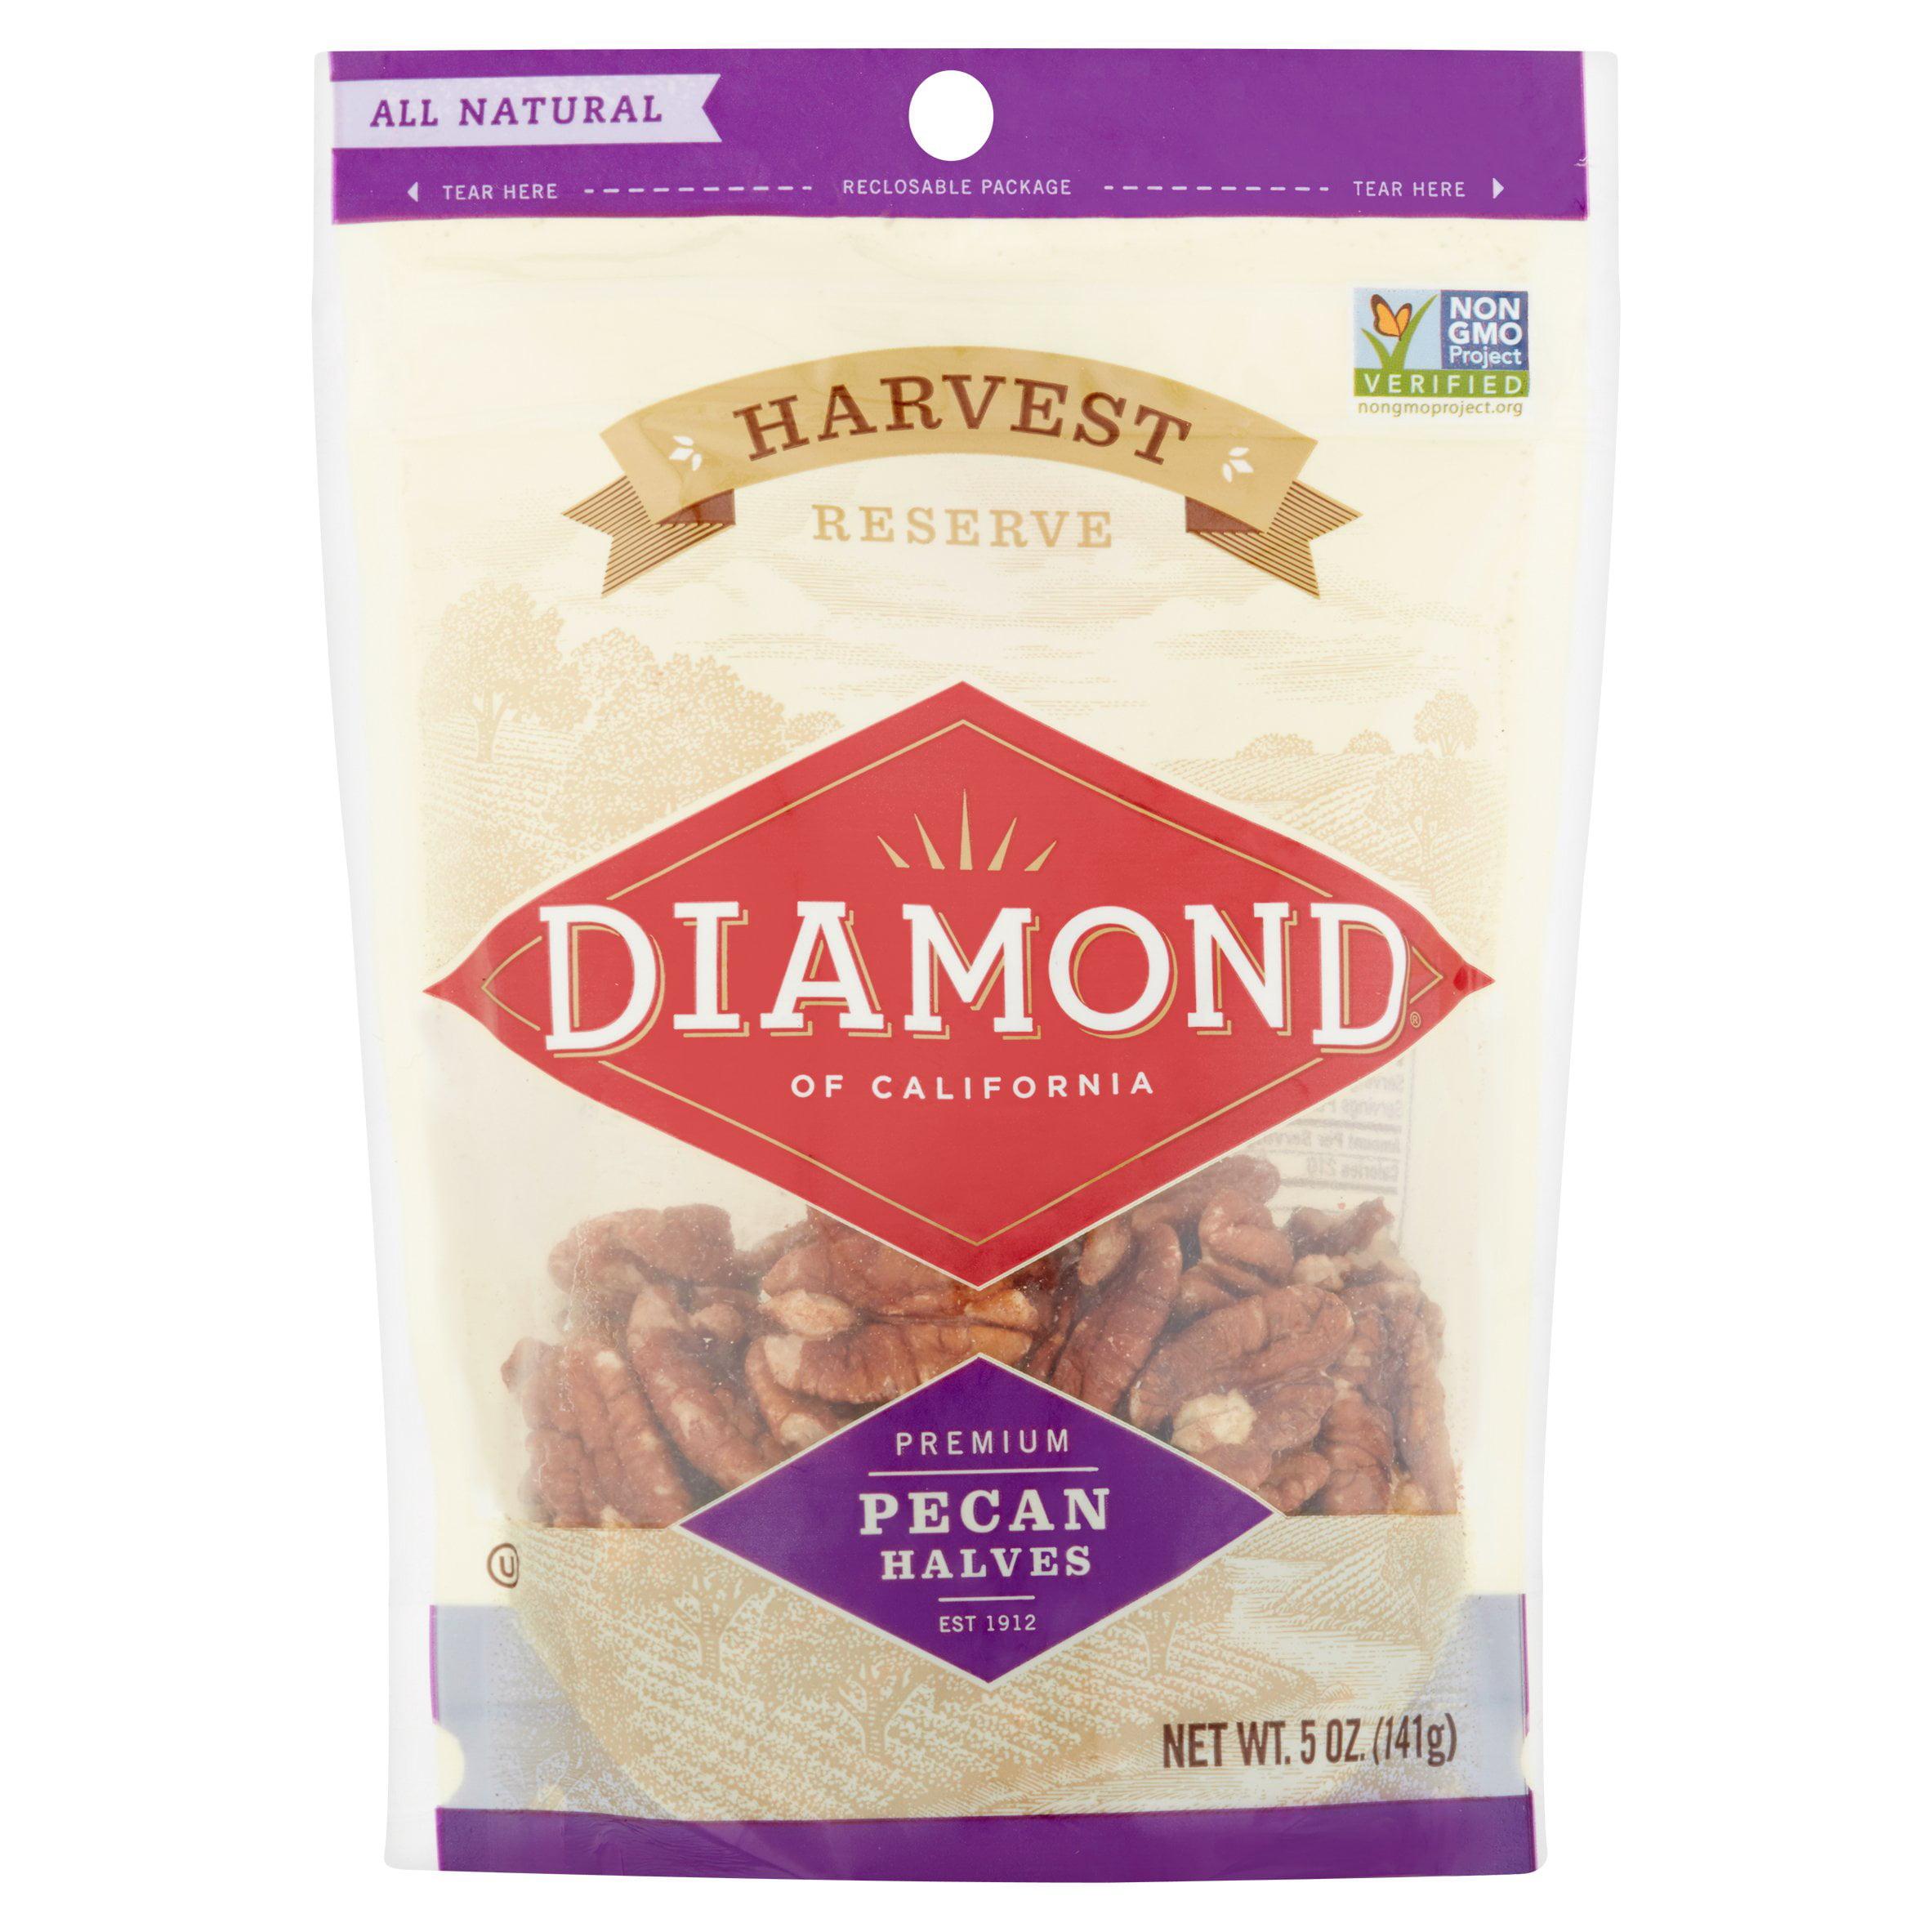 Diamond of California Harvest Reserve Premium Pecan Halves, 5.0 OZ by Diamond Foods, Inc.